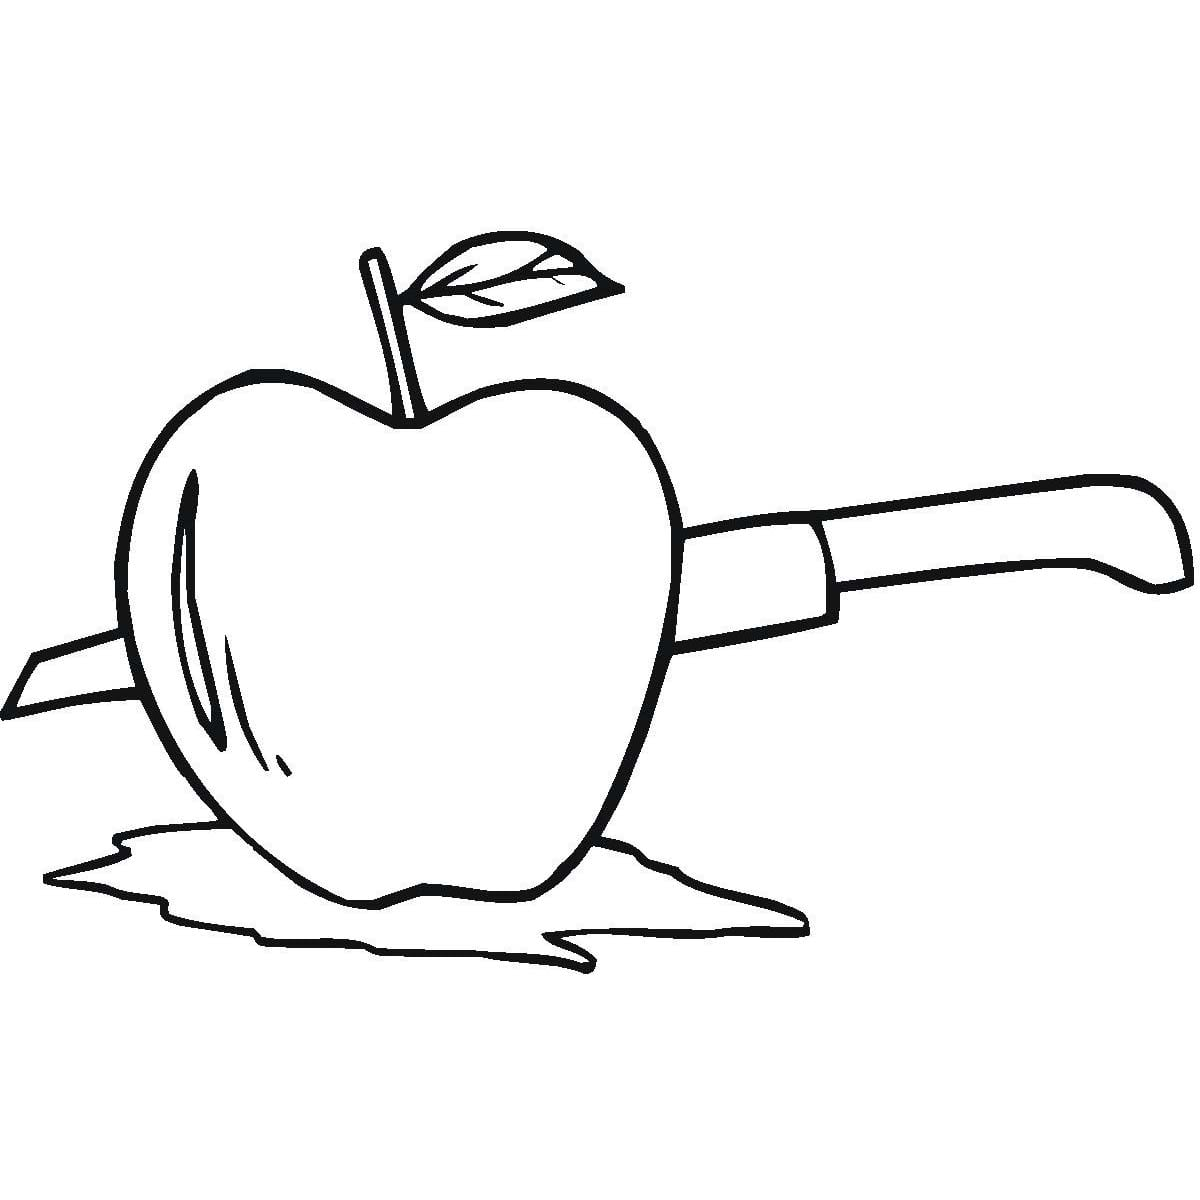 Desenho De Faca Cortando Maçã Para Colorir